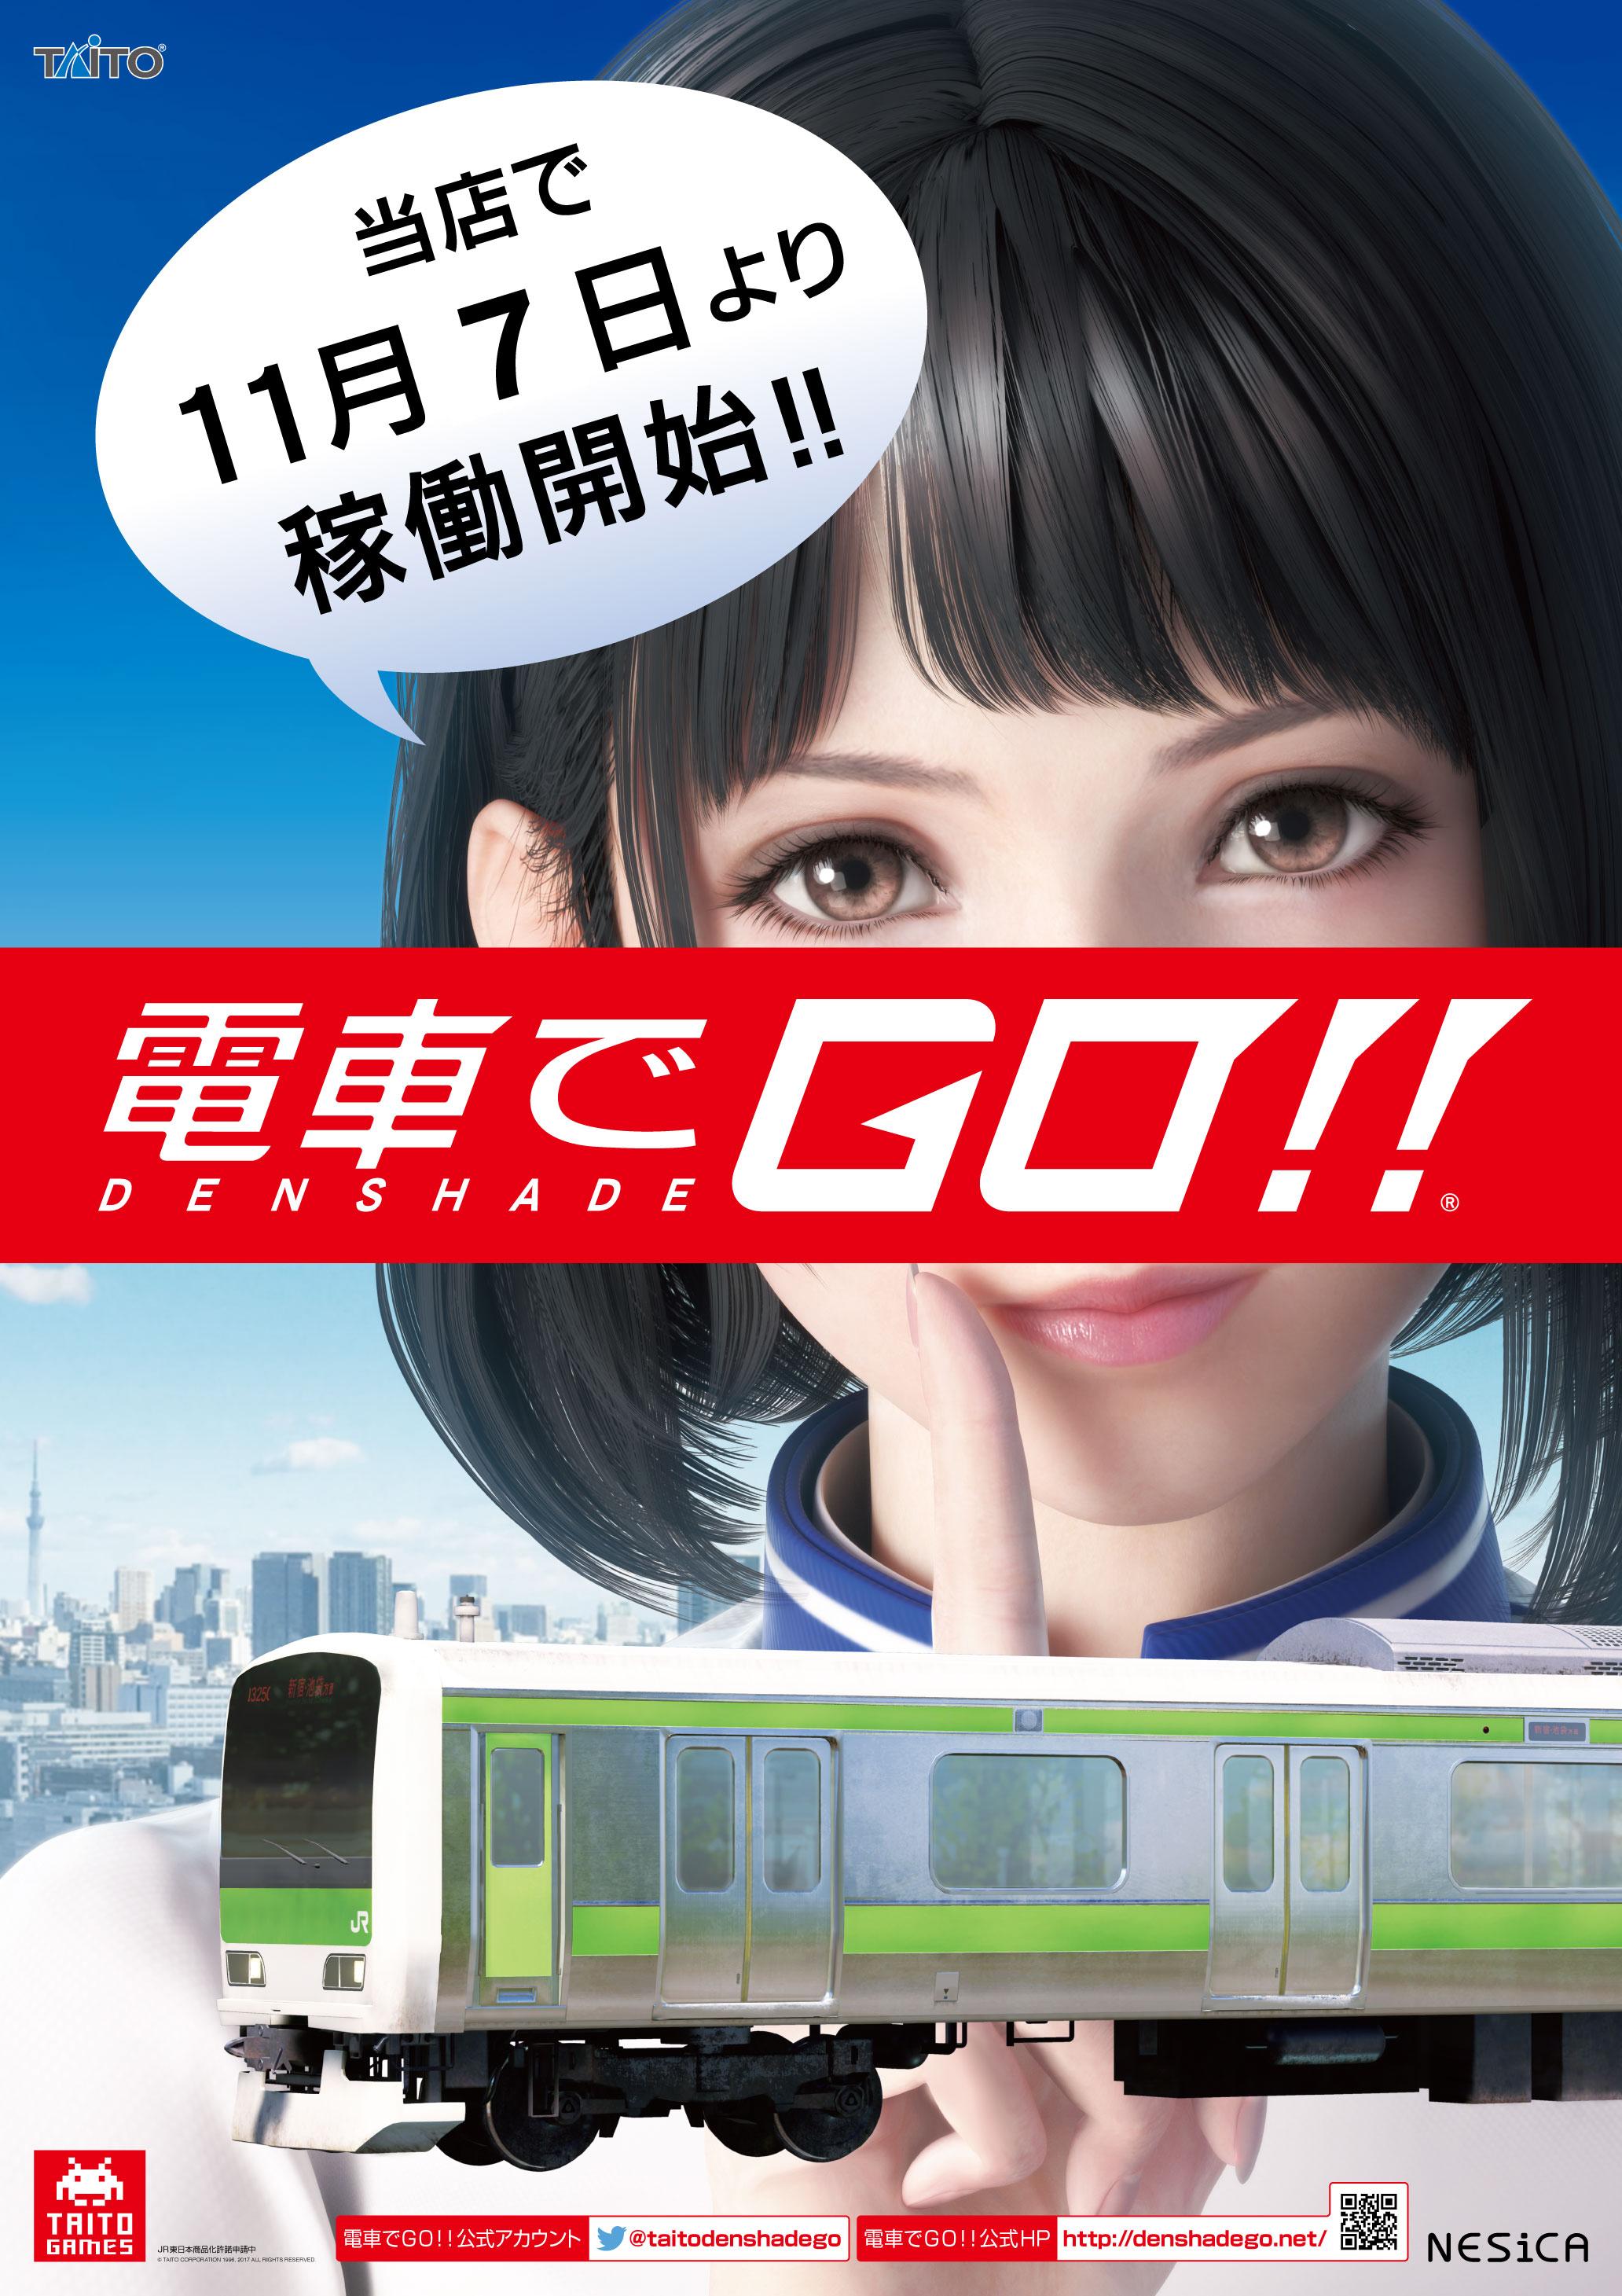 http://game.watch.impress.co.jp/img/gmw/docs/1084/738/dengo11_01.jpg